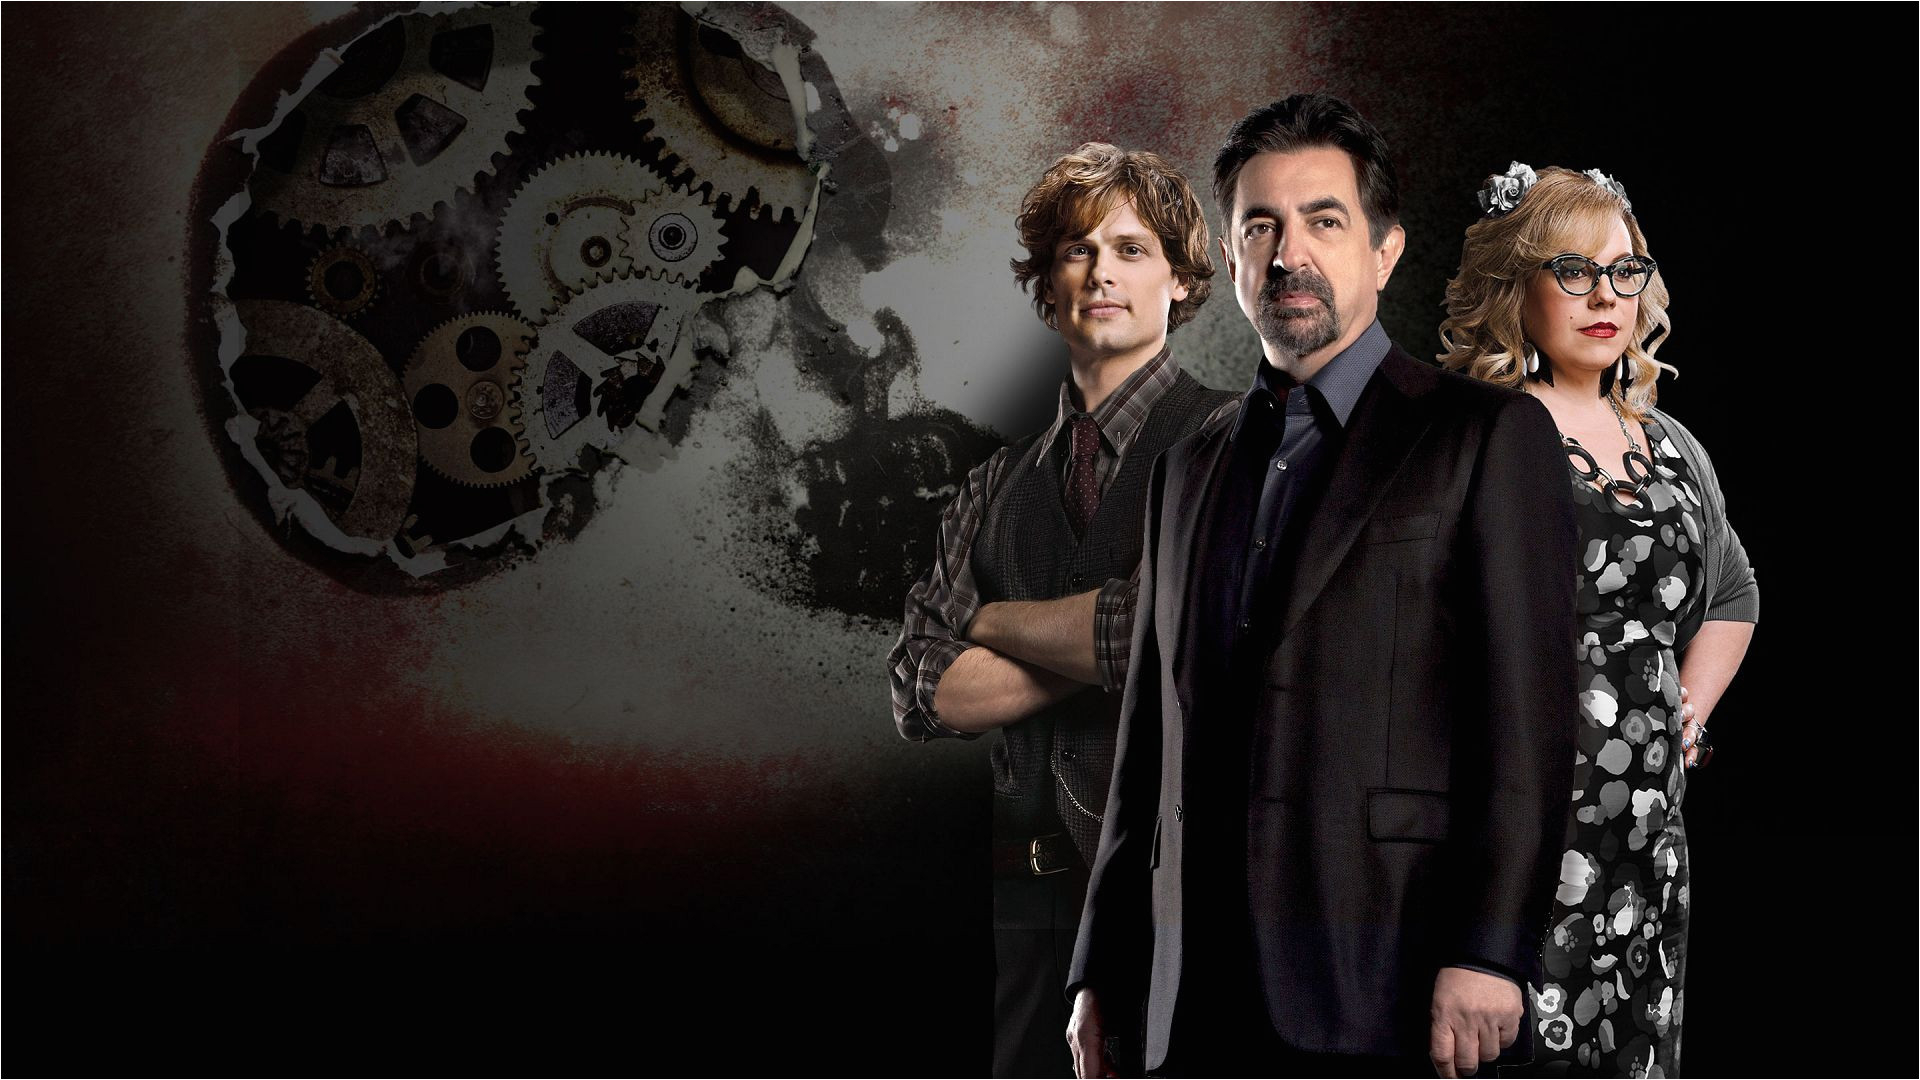 Watch Salem Season 3 Episode 1 Online Free Criminal Minds Official Site Watch On Cbs All Access